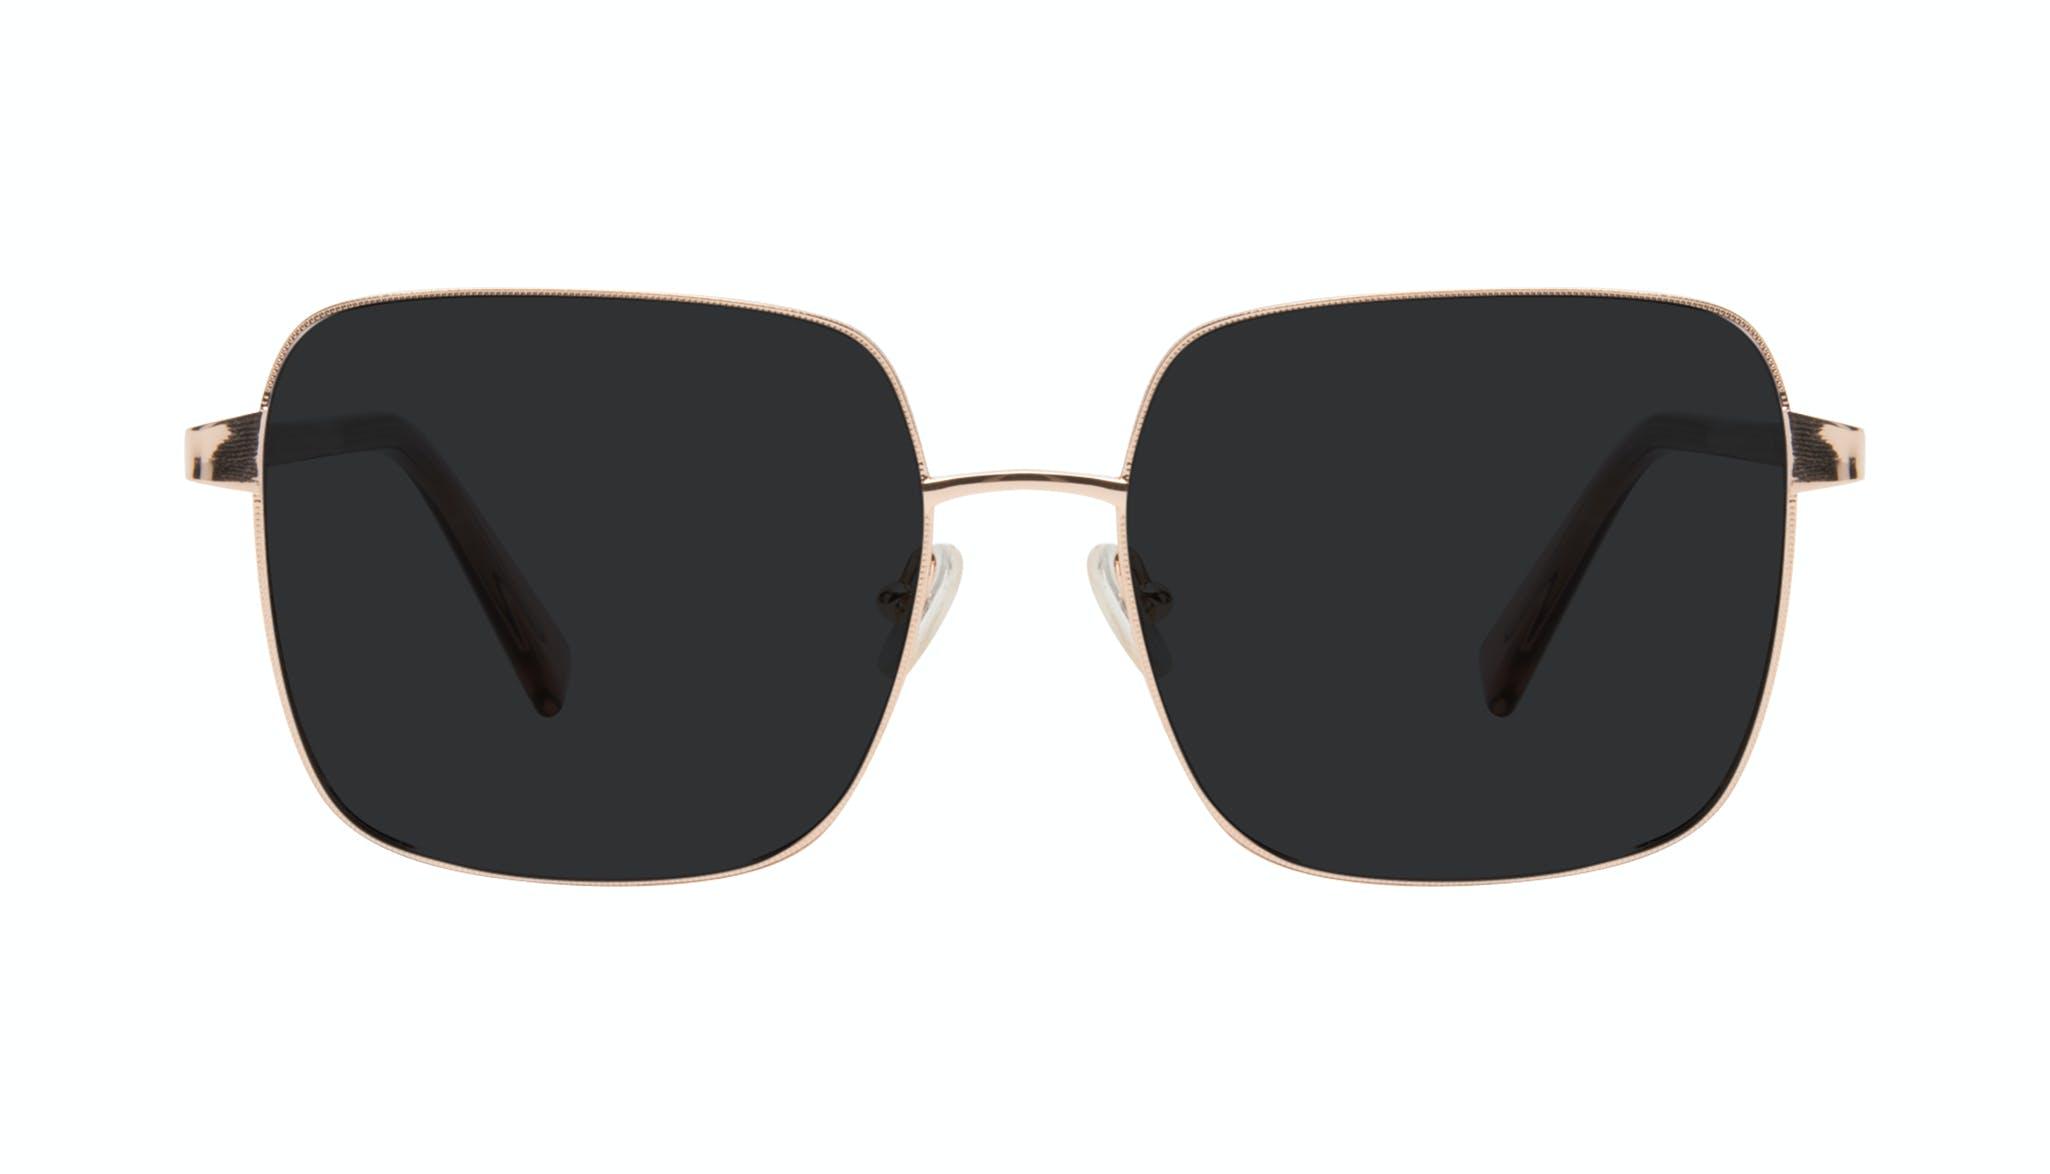 Affordable Fashion Glasses Square Sunglasses Women Fab Rose